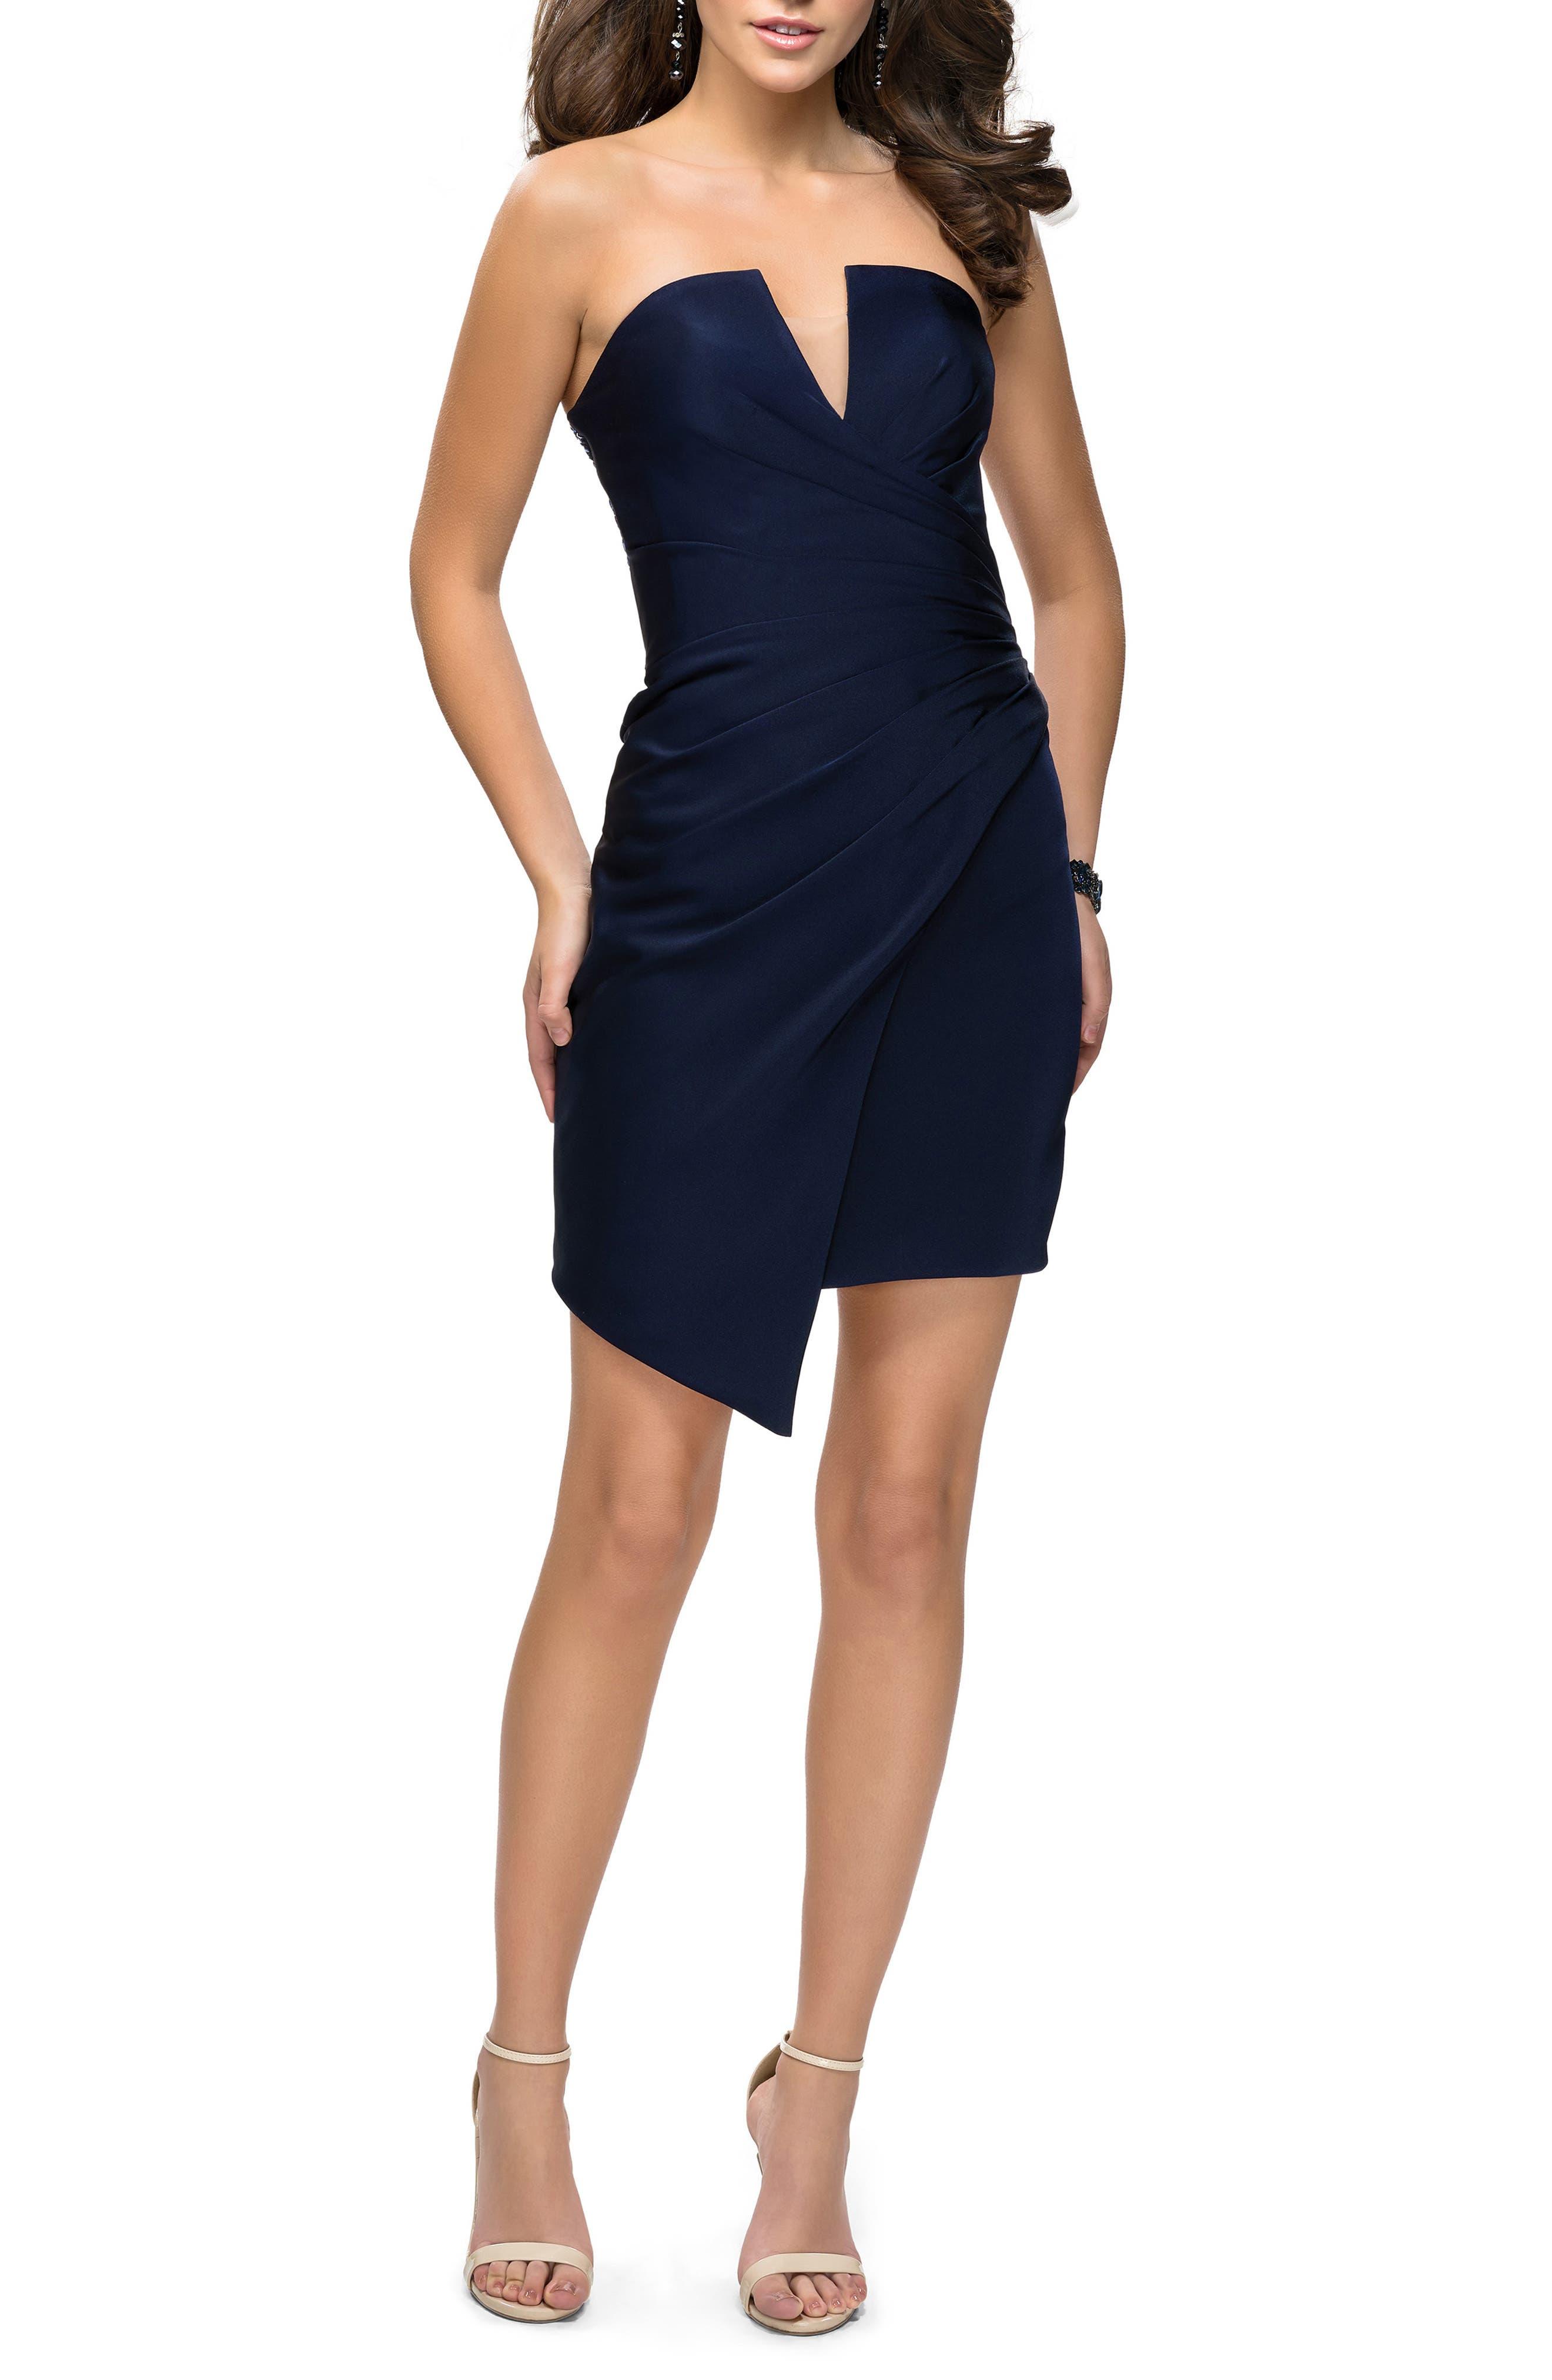 Strapless Asymmetrical Party Dress,                             Main thumbnail 1, color,                             NAVY